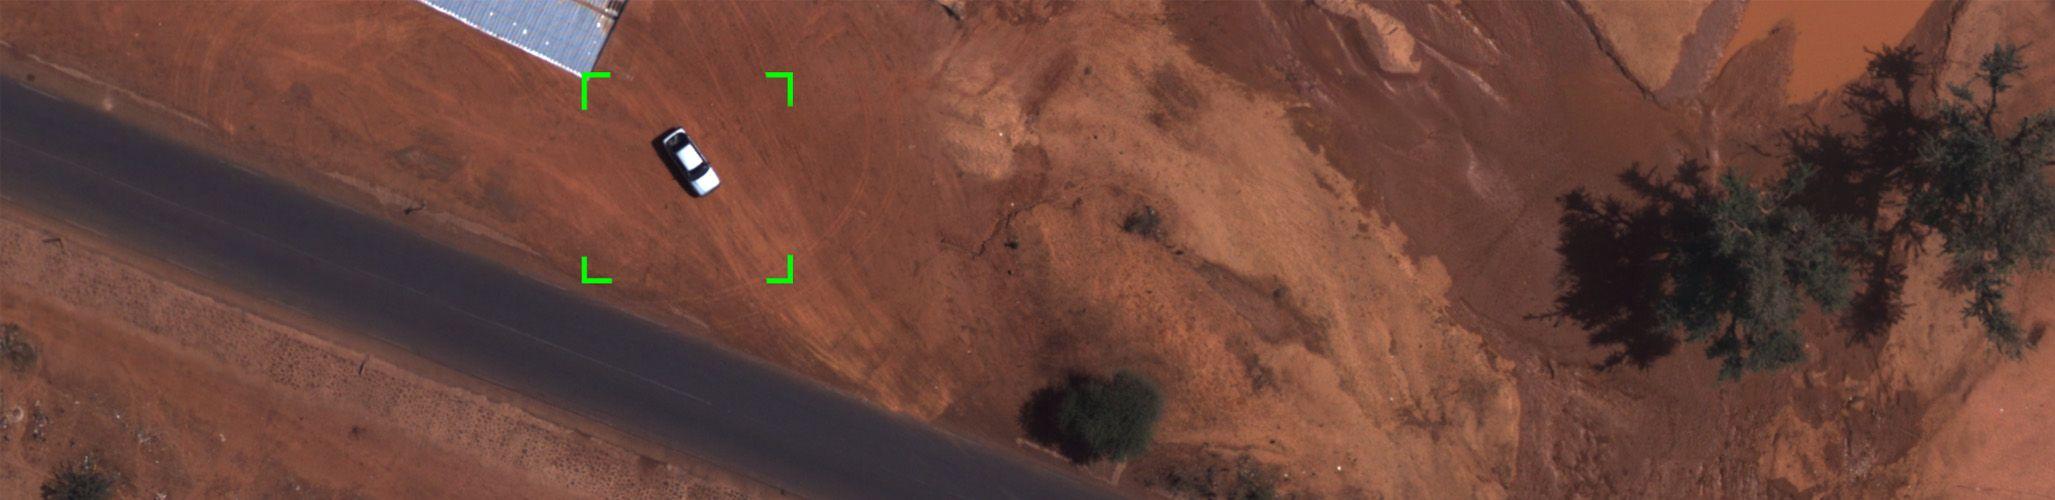 Long range UAVs vehicle detection